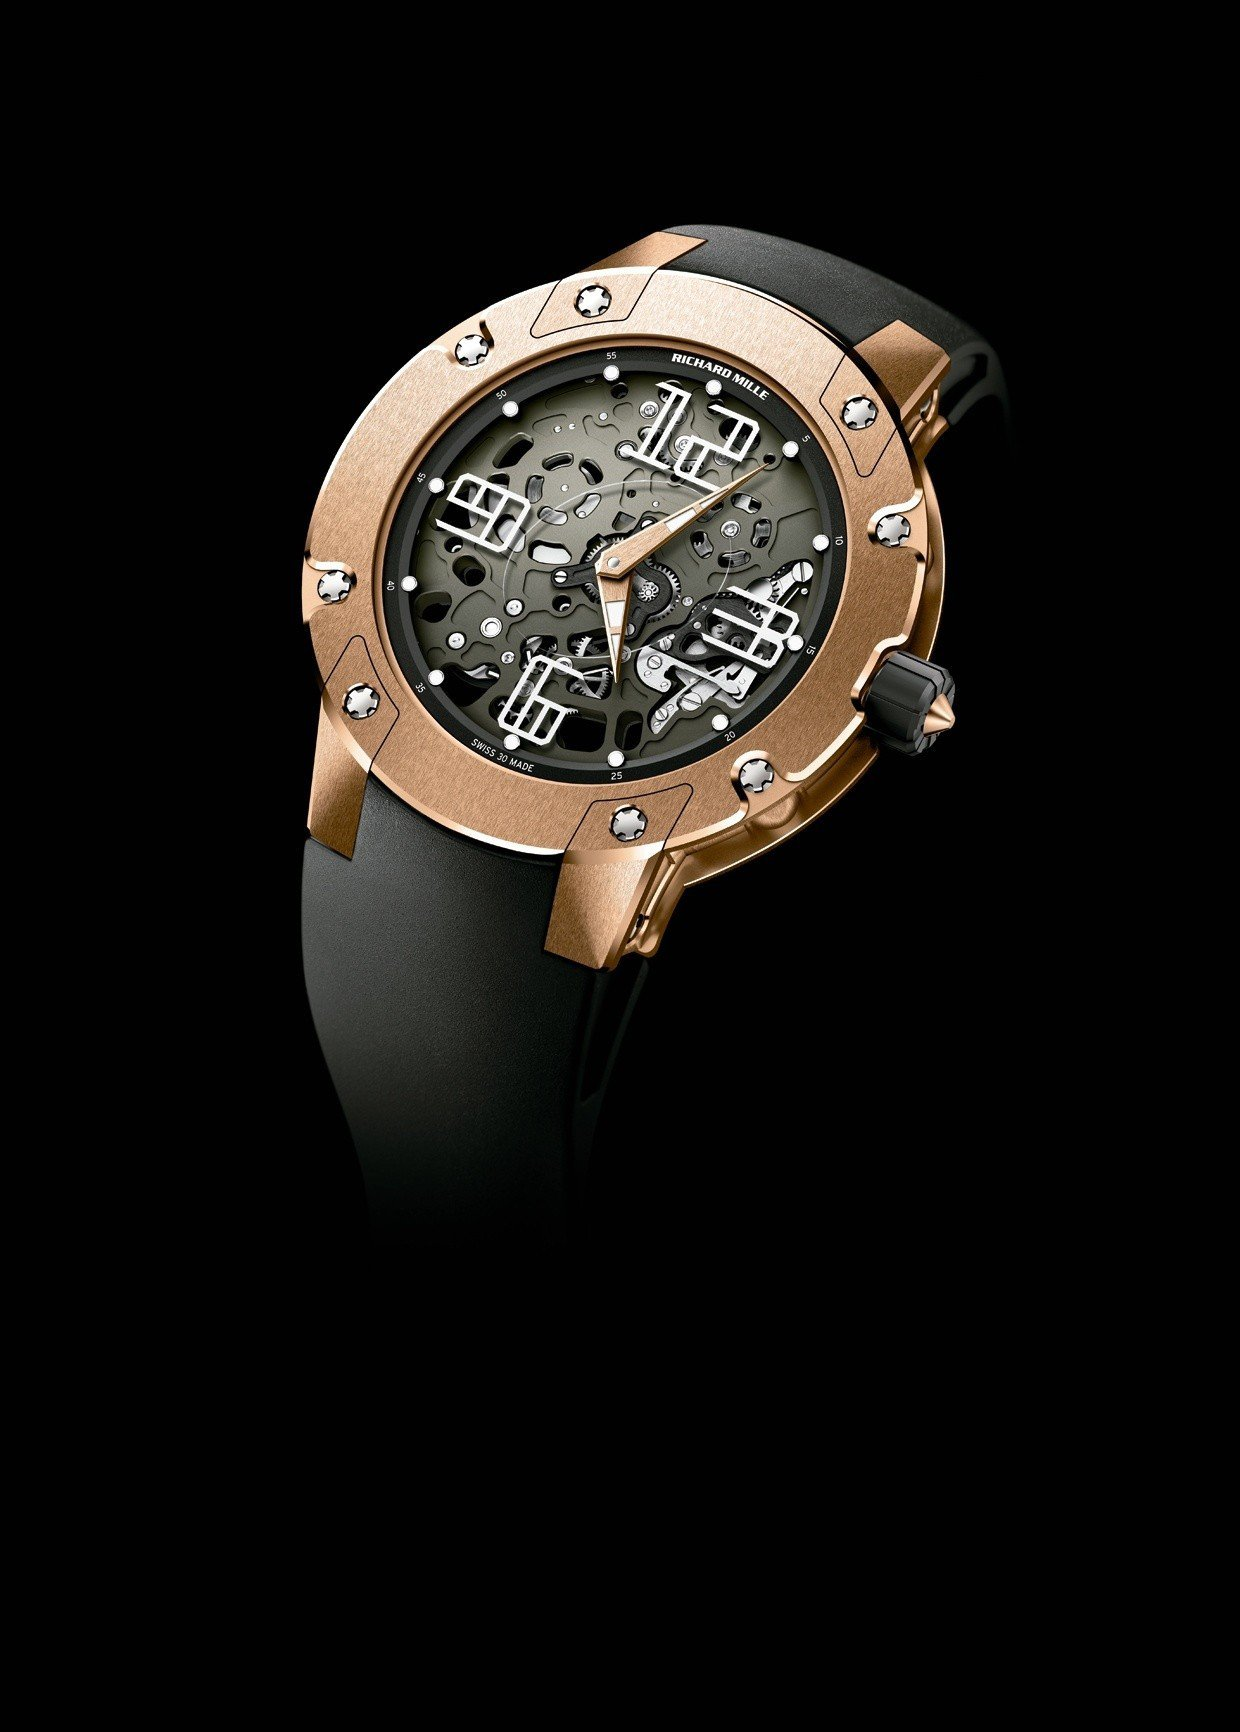 RICHARD MILLE RM033超薄腕表,18K玫瑰金表殼,搭載鏤空RMX...